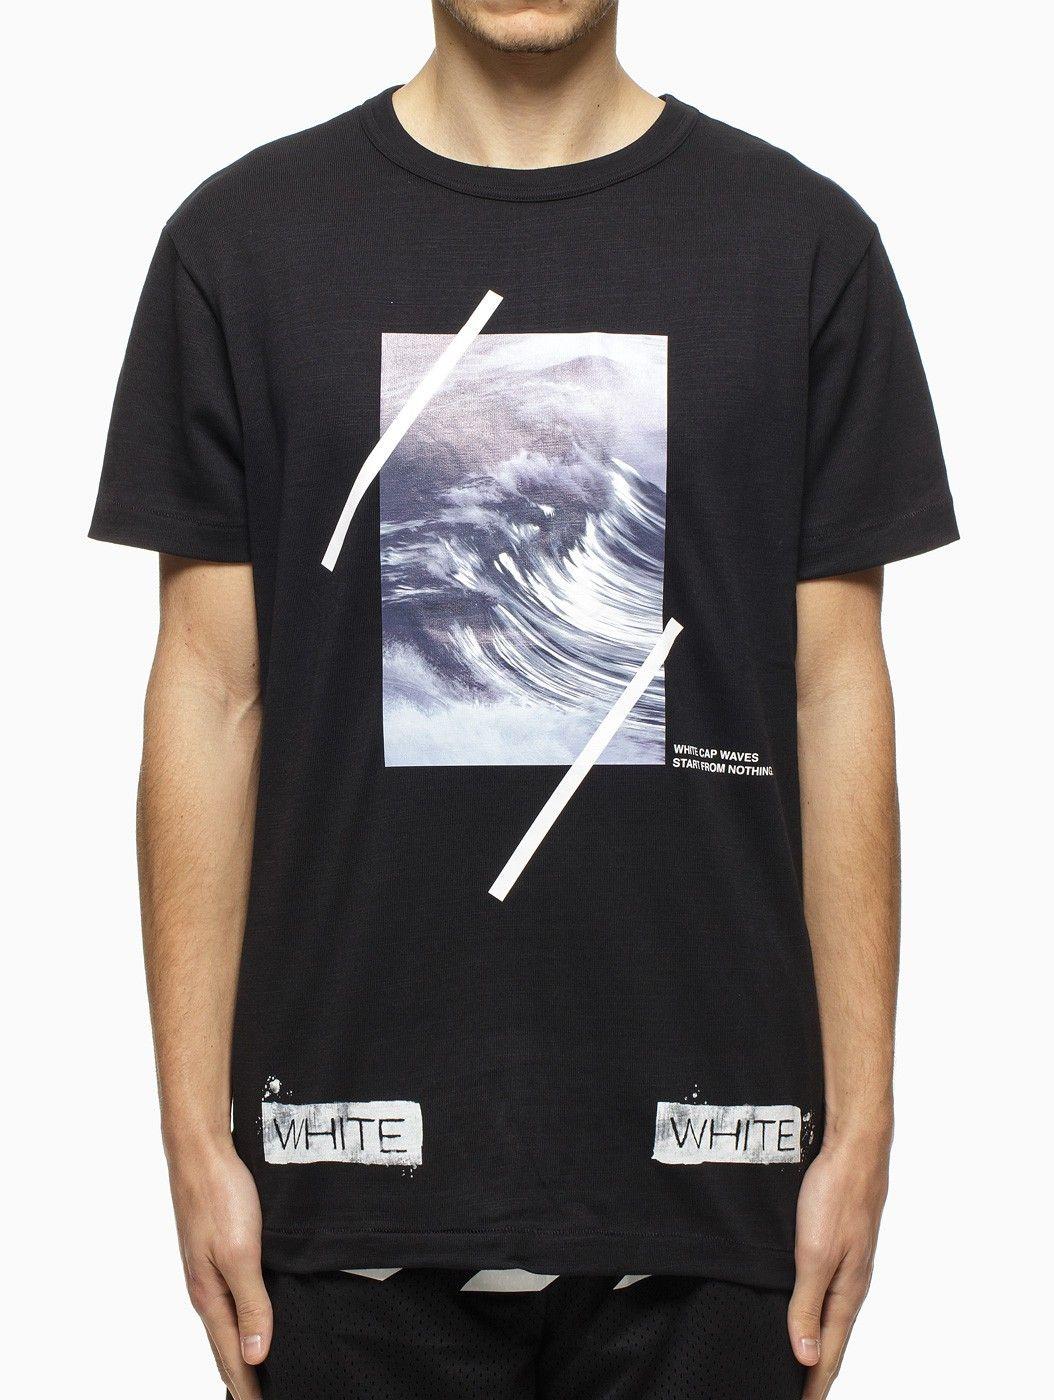 "76e0dd5d ""Waves"" t-shirt from the S/S2015 Off-White c/o Virgil Abloh collection in  black."